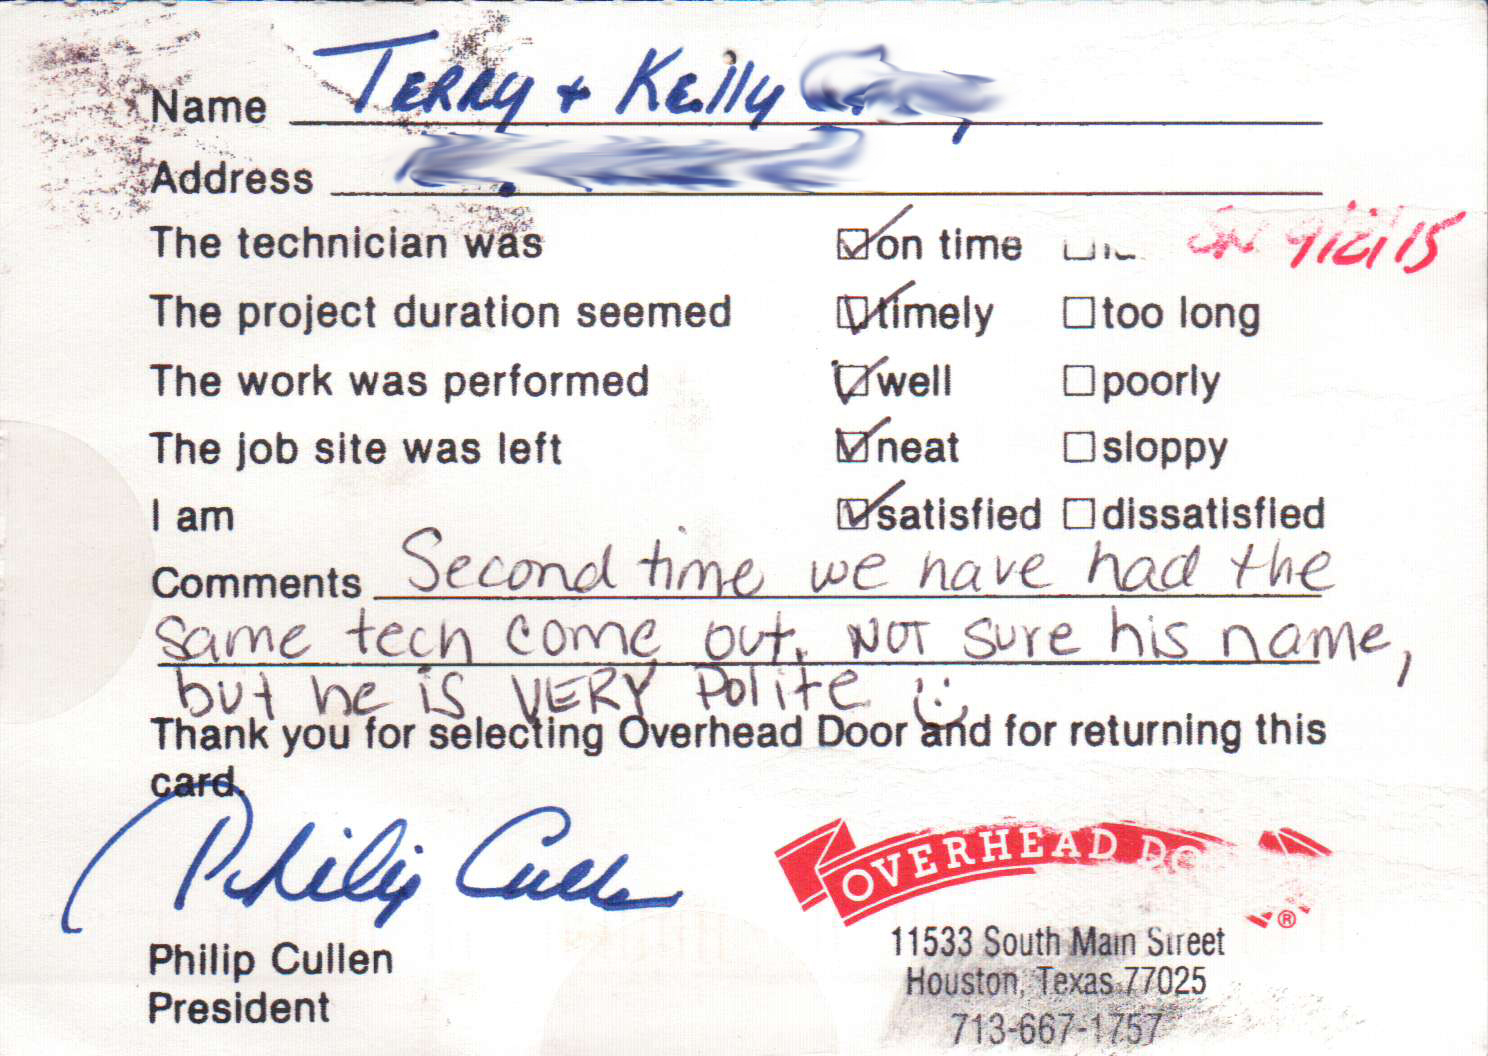 Terry & Kelly